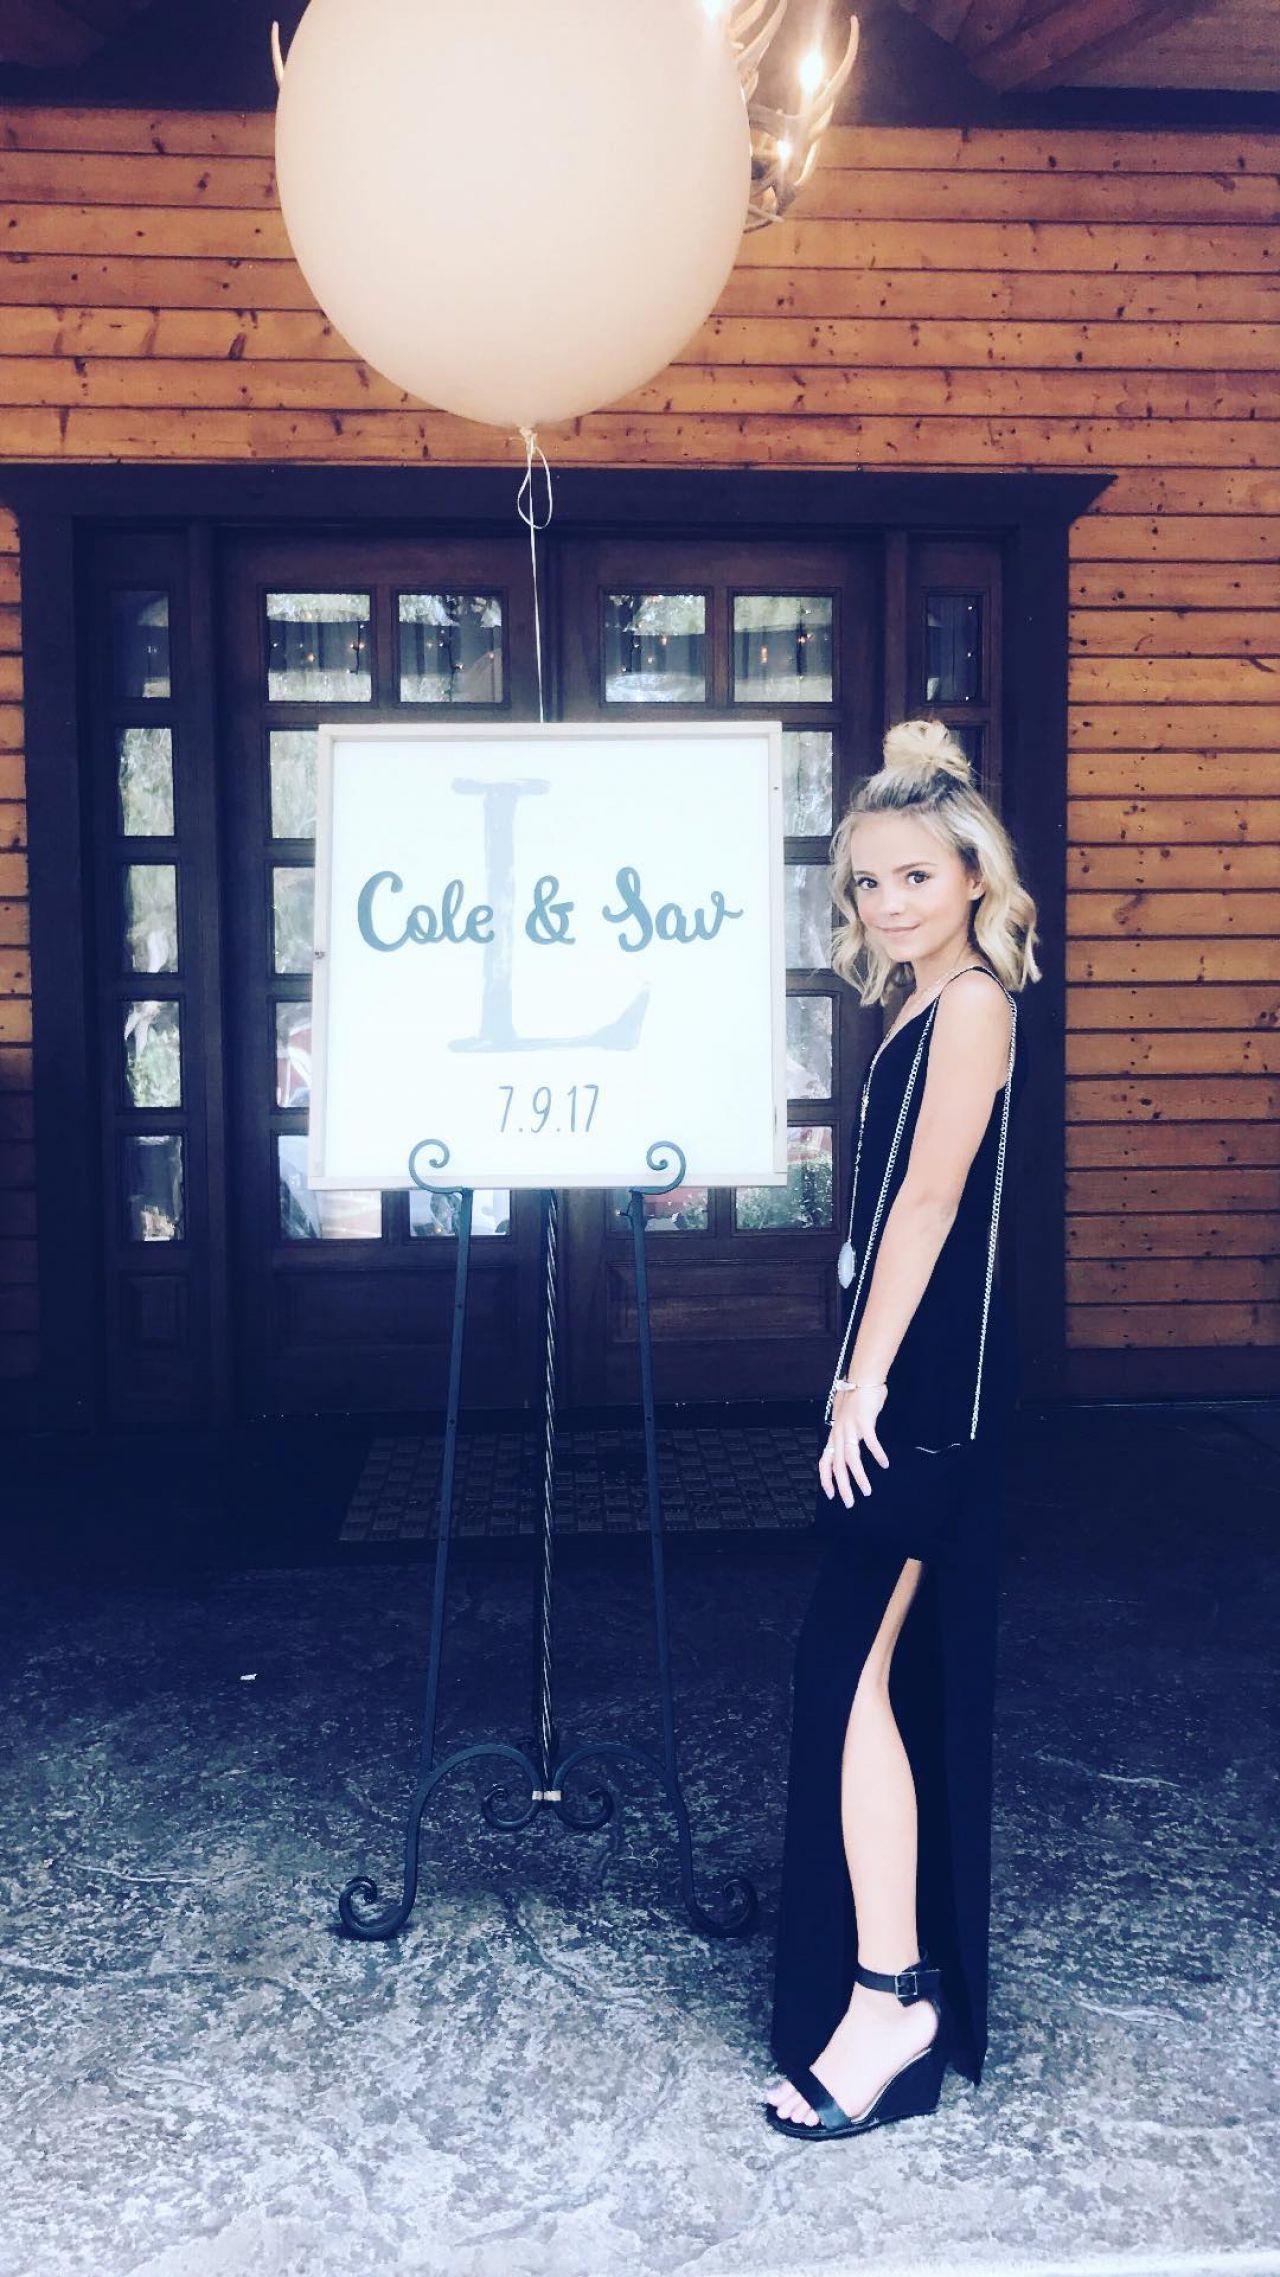 Vandy jaiden social media pics july 2019 nude (48 photos), Selfie Celebrity foto